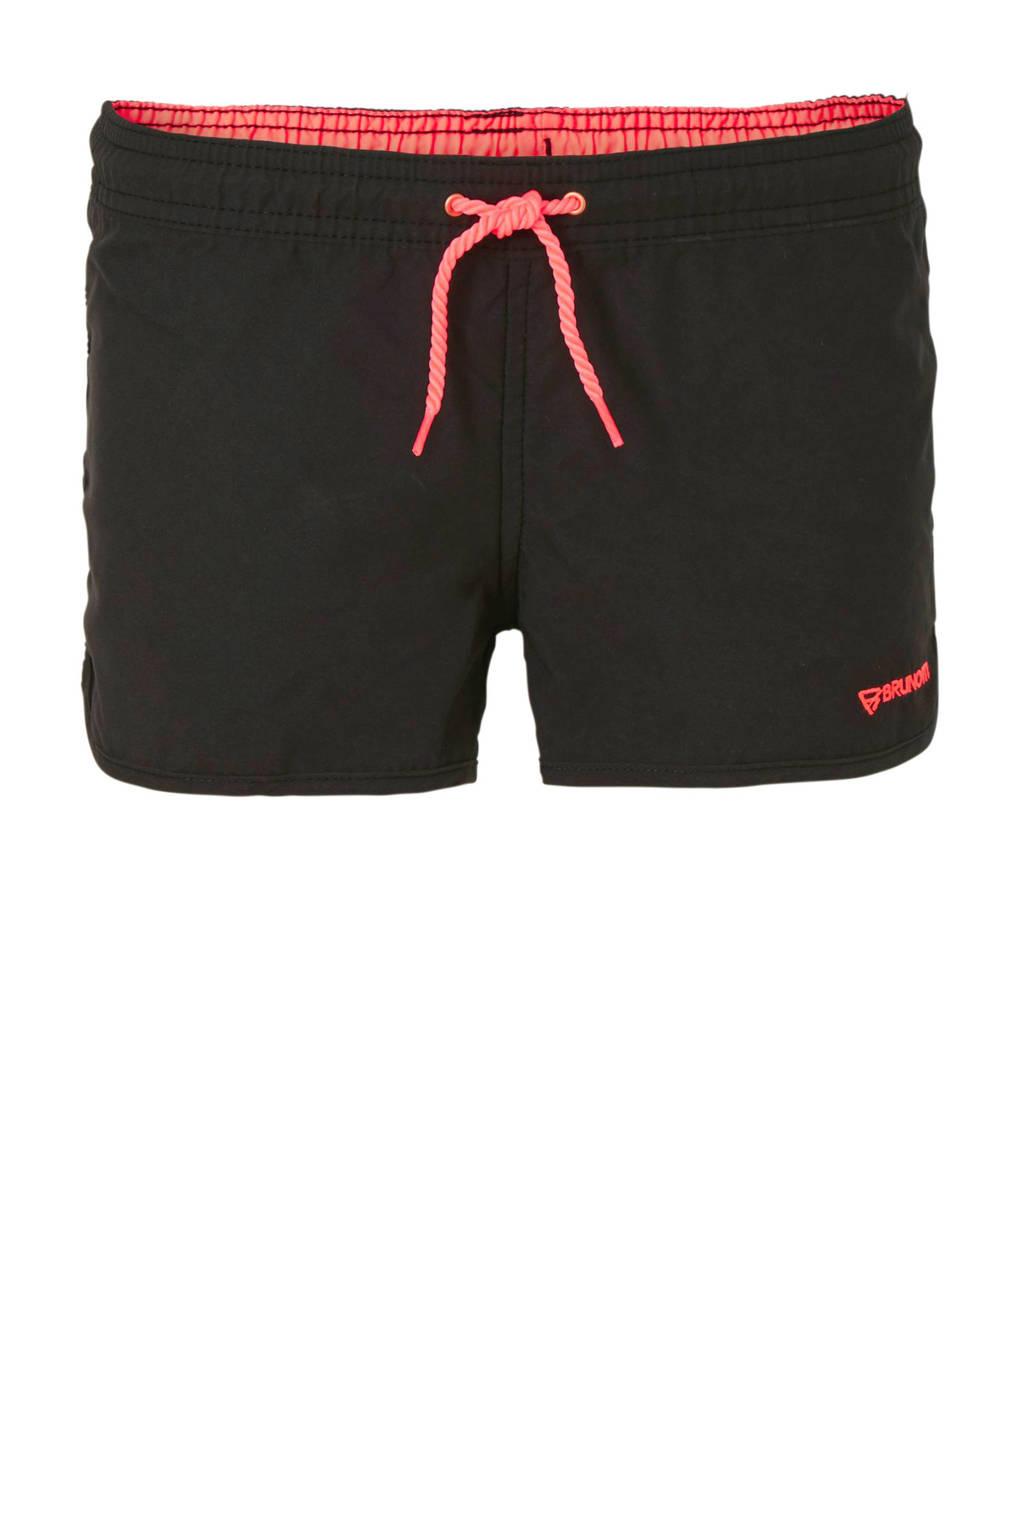 Brunotti Korte Broek Dames.Brunotti Zwemshort Quick Dry Uni Zwart Wehkamp